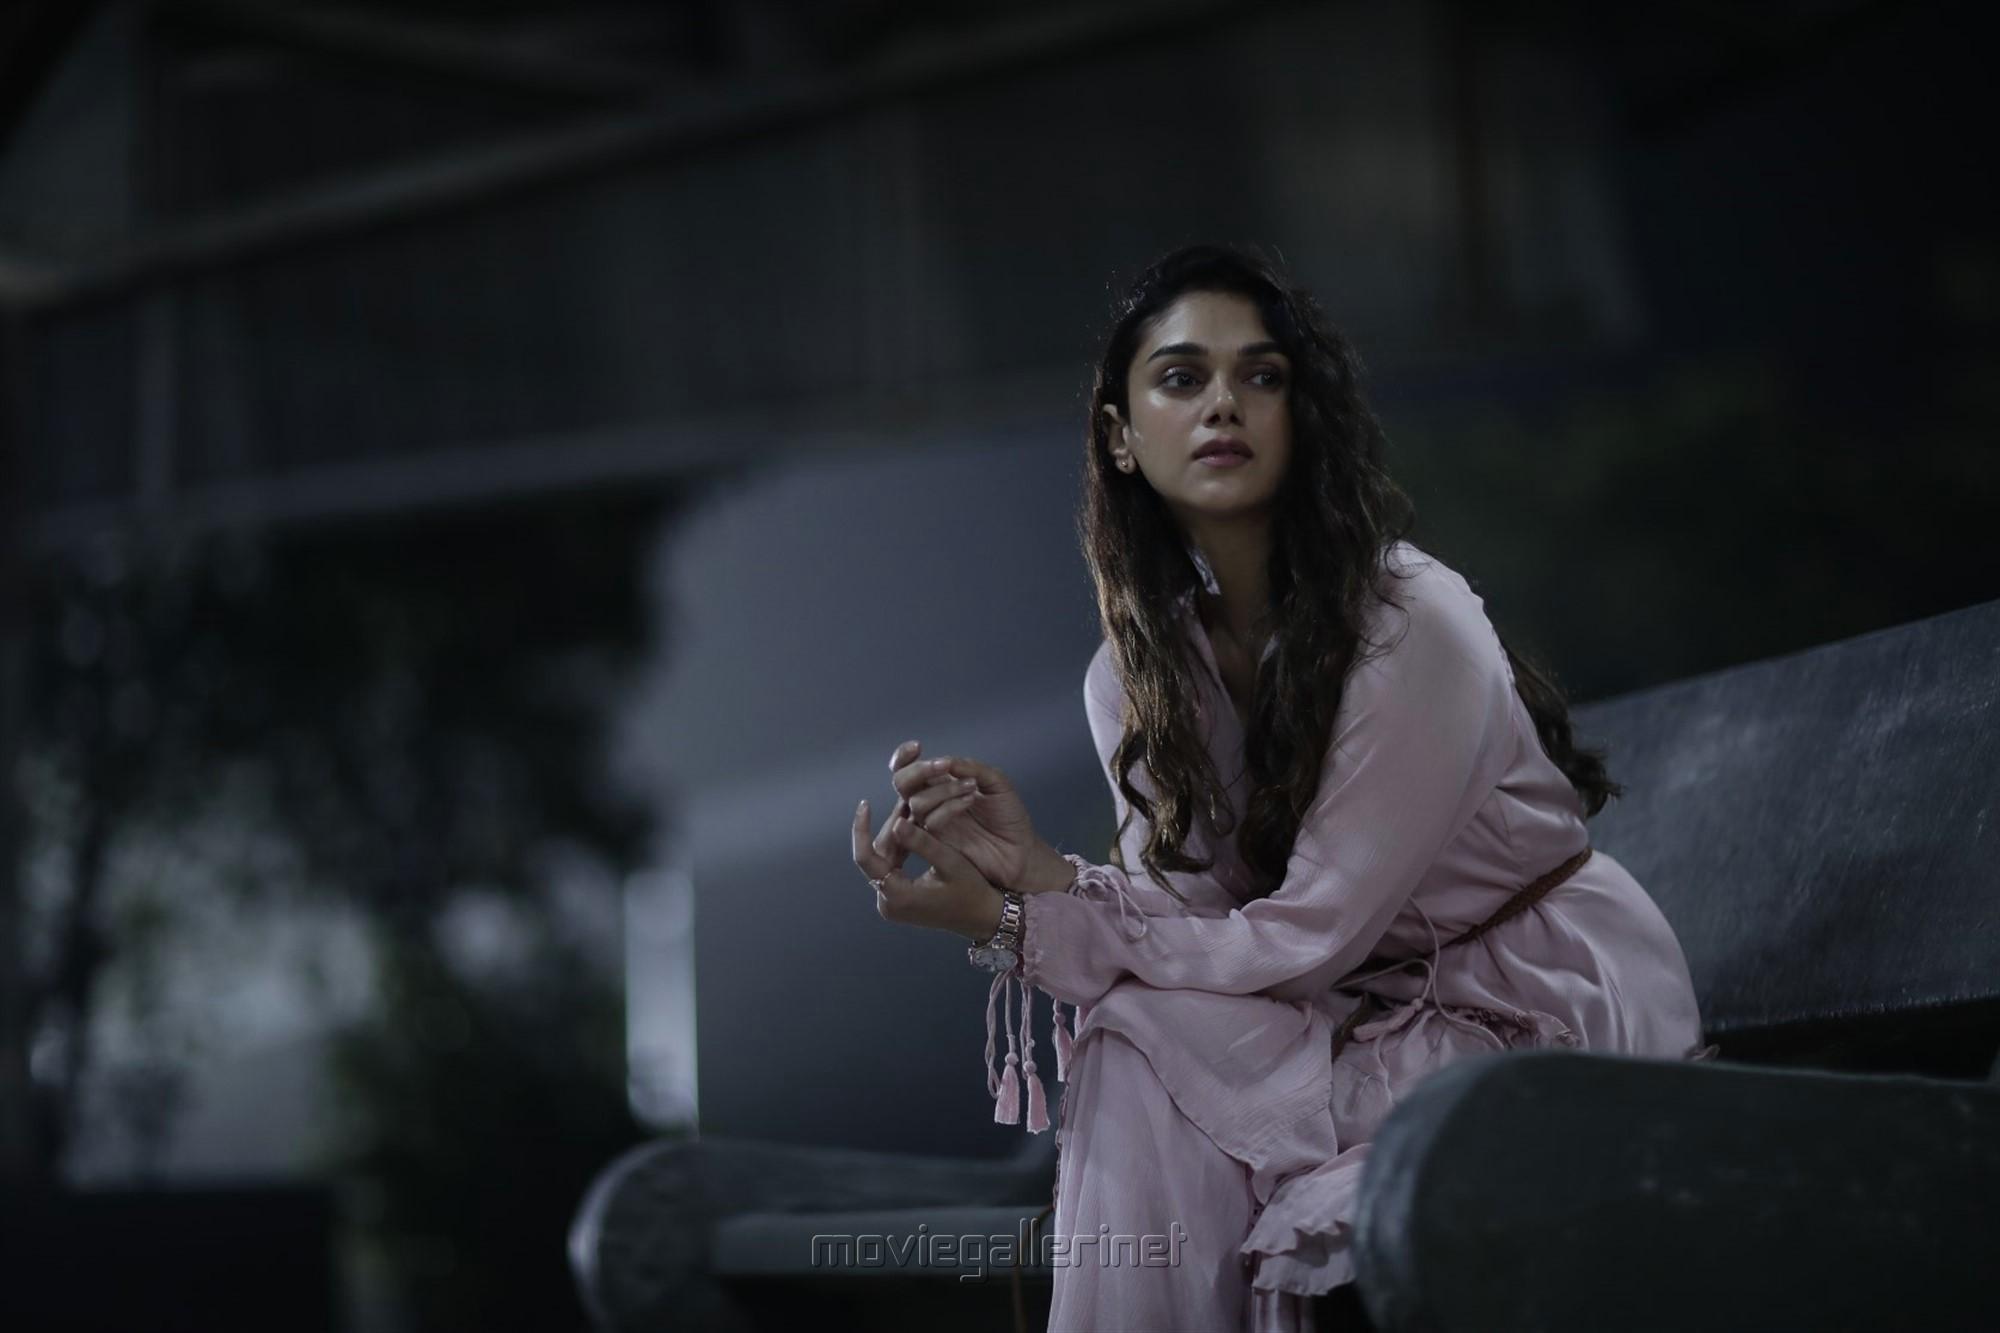 Actress Aditi Rao Hydari in Psycho Movie Images HD